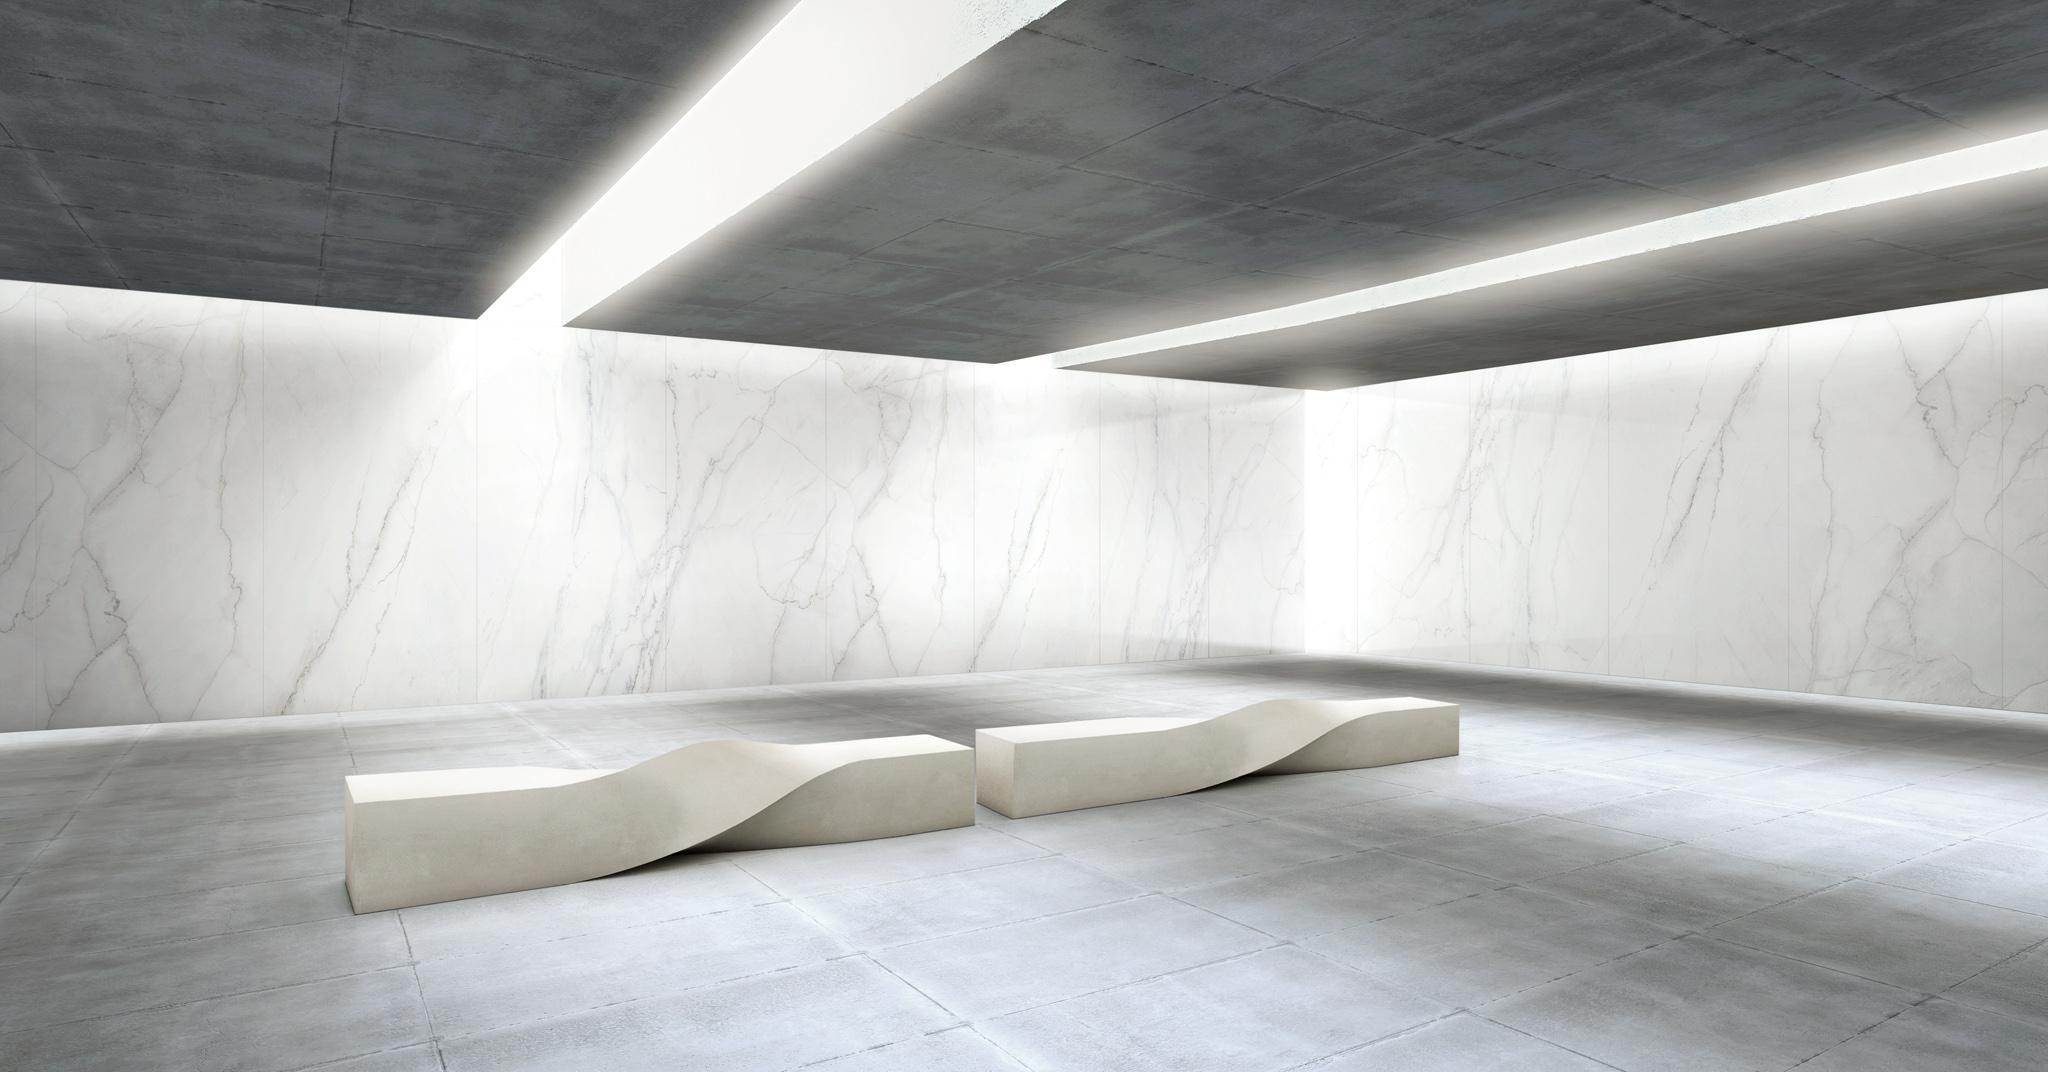 porcelain tile images: Majestic range high quality photo